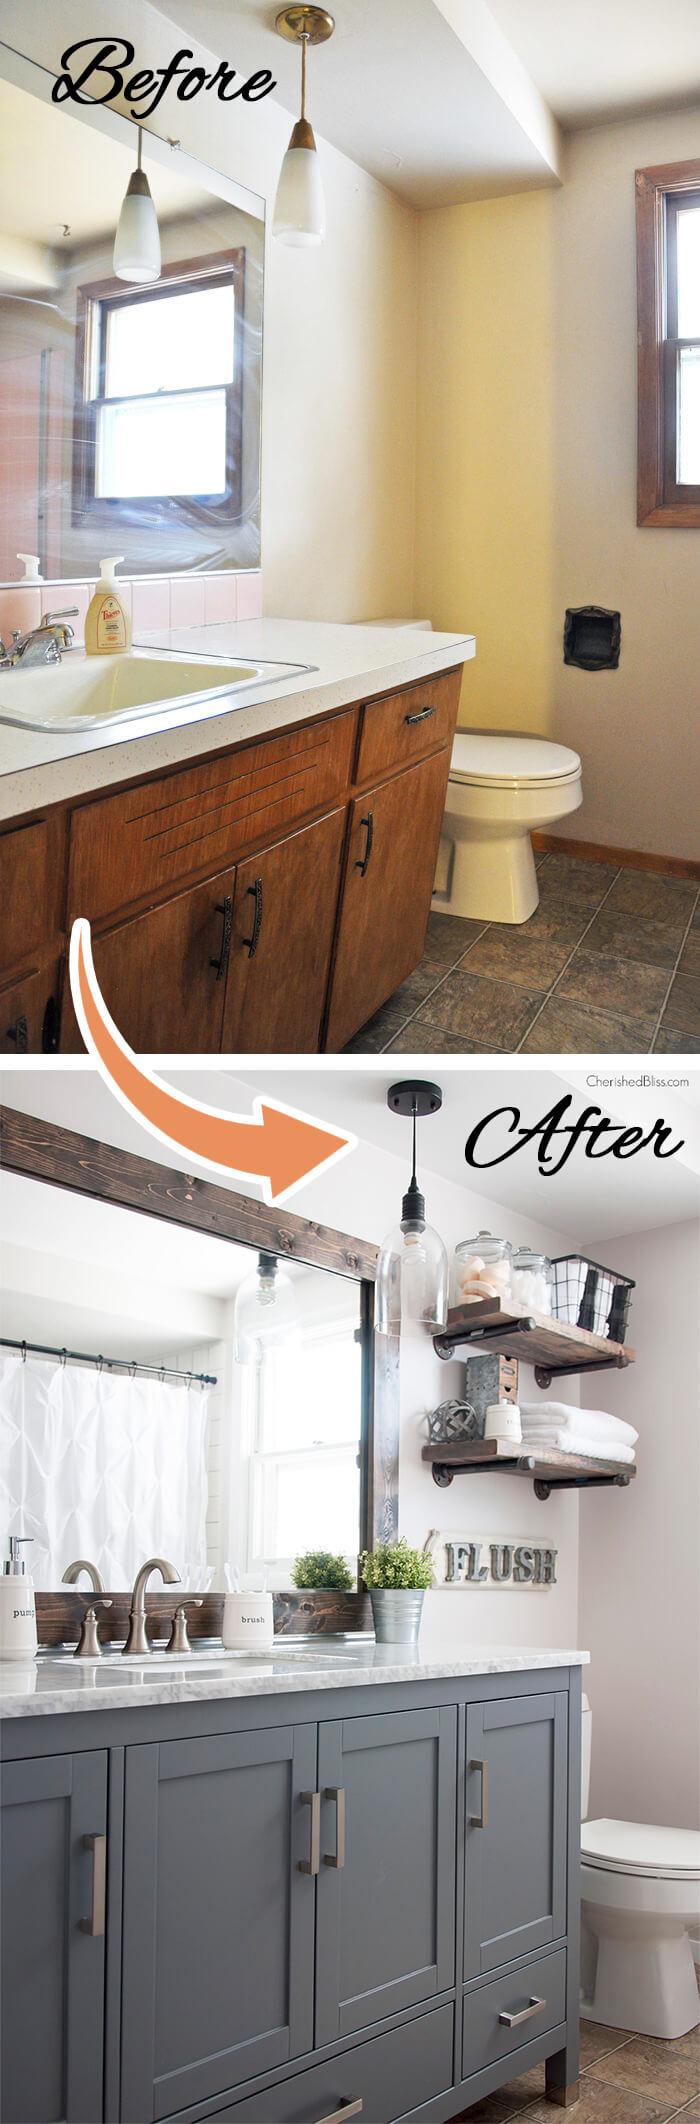 28 Best Budget Friendly Bathroom Makeover Ideas and ... on Bathroom Ideas On A Budget  id=41444